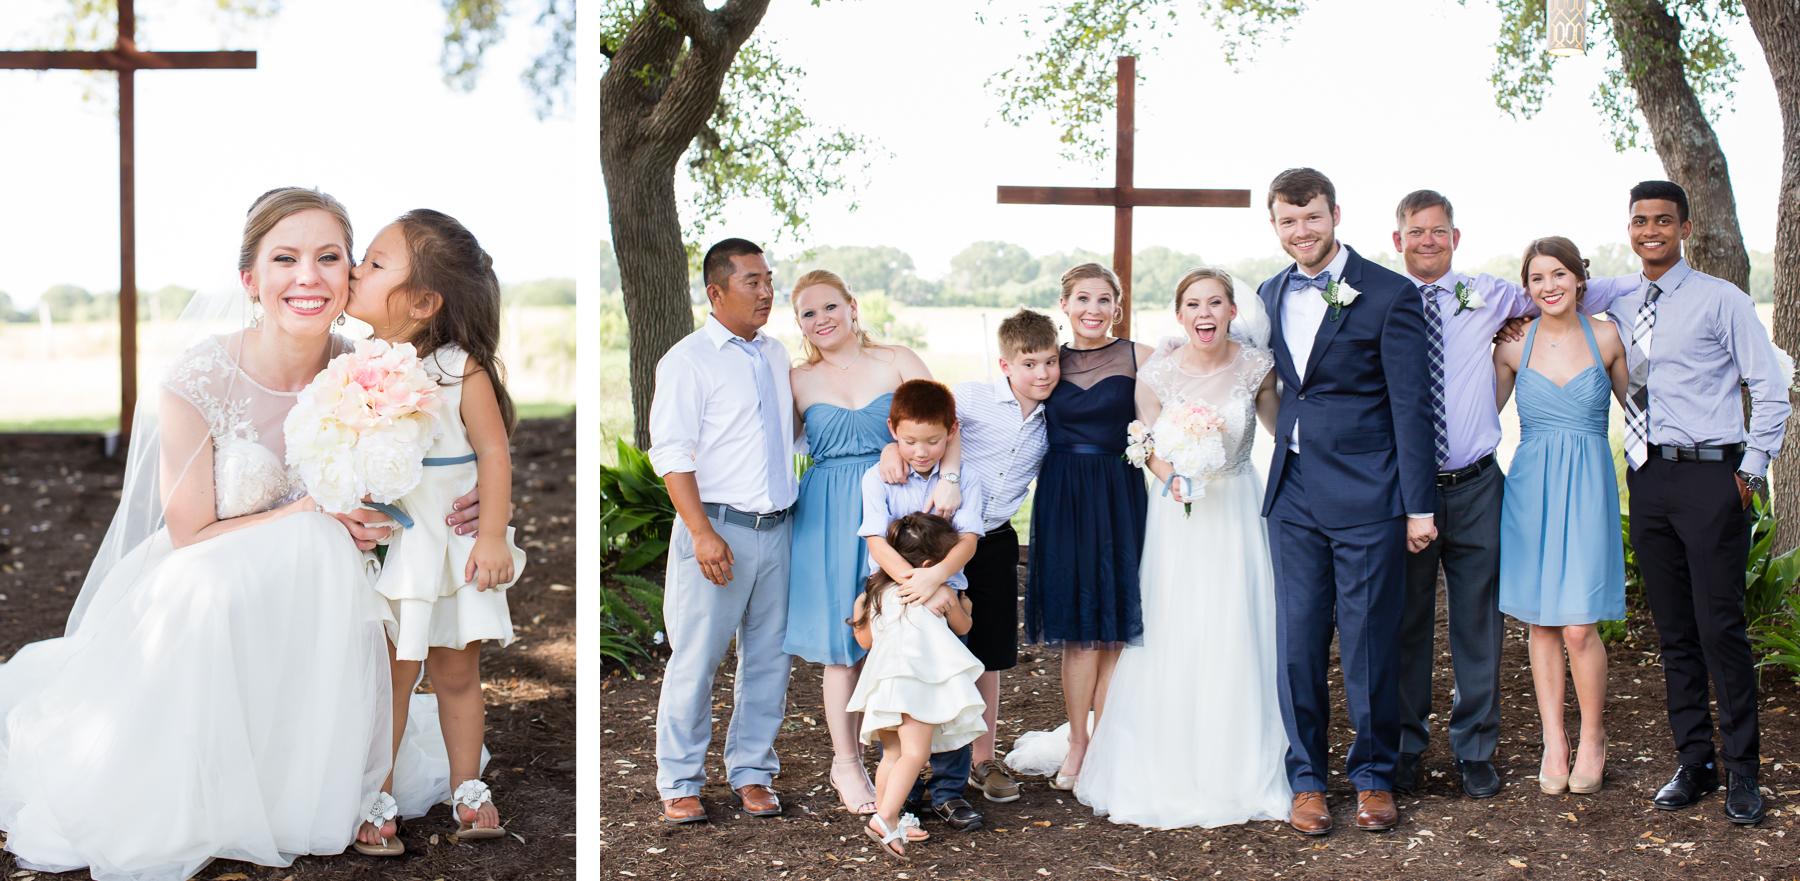 candid-family-wedding-photo-ideas.jpg